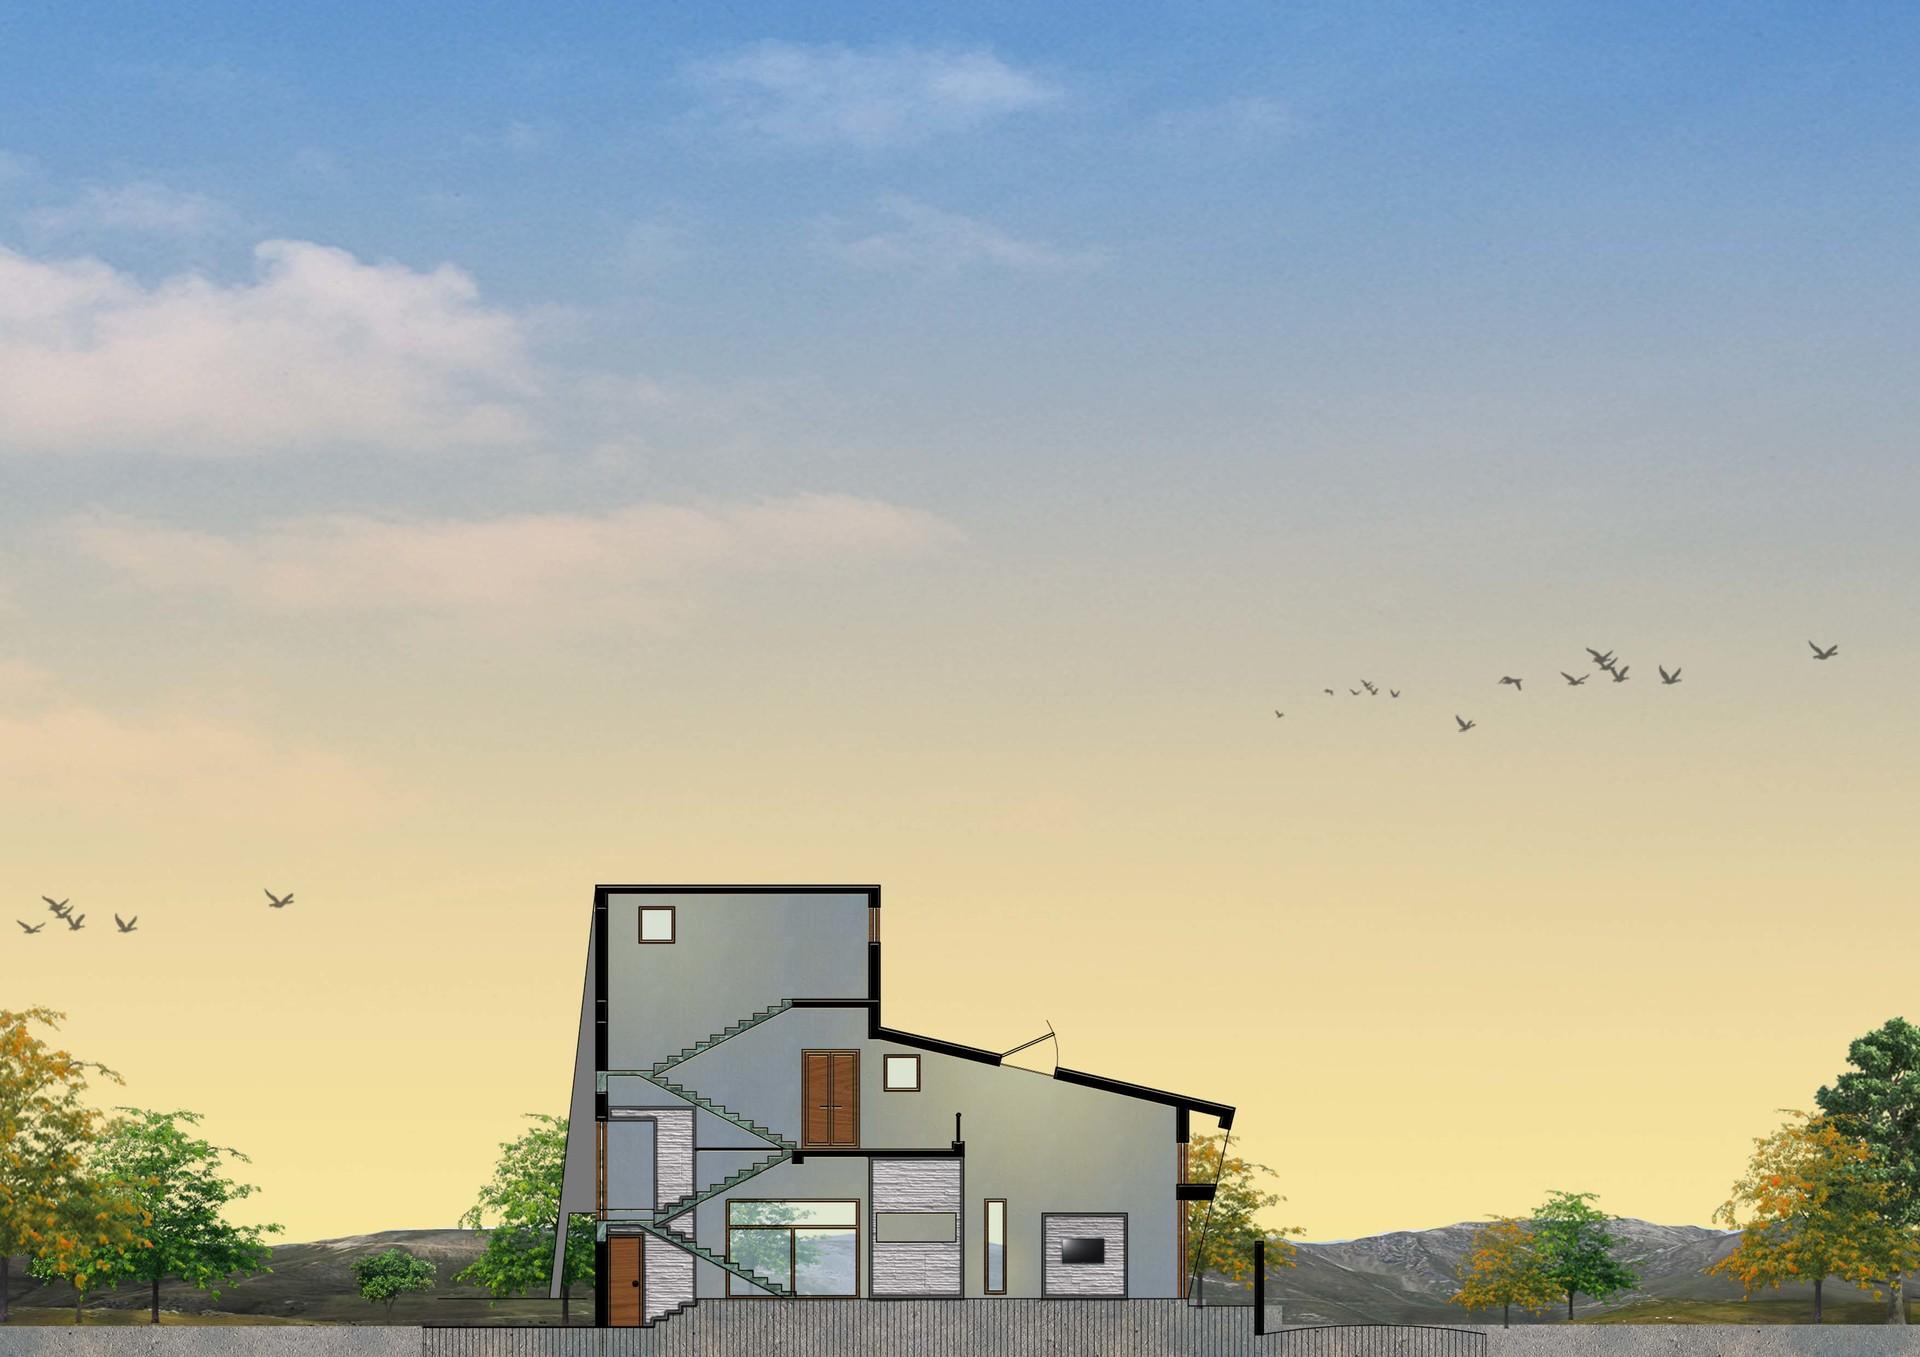 ArtStation - Architecture plan render in Photoshop , Aishwarya Binani